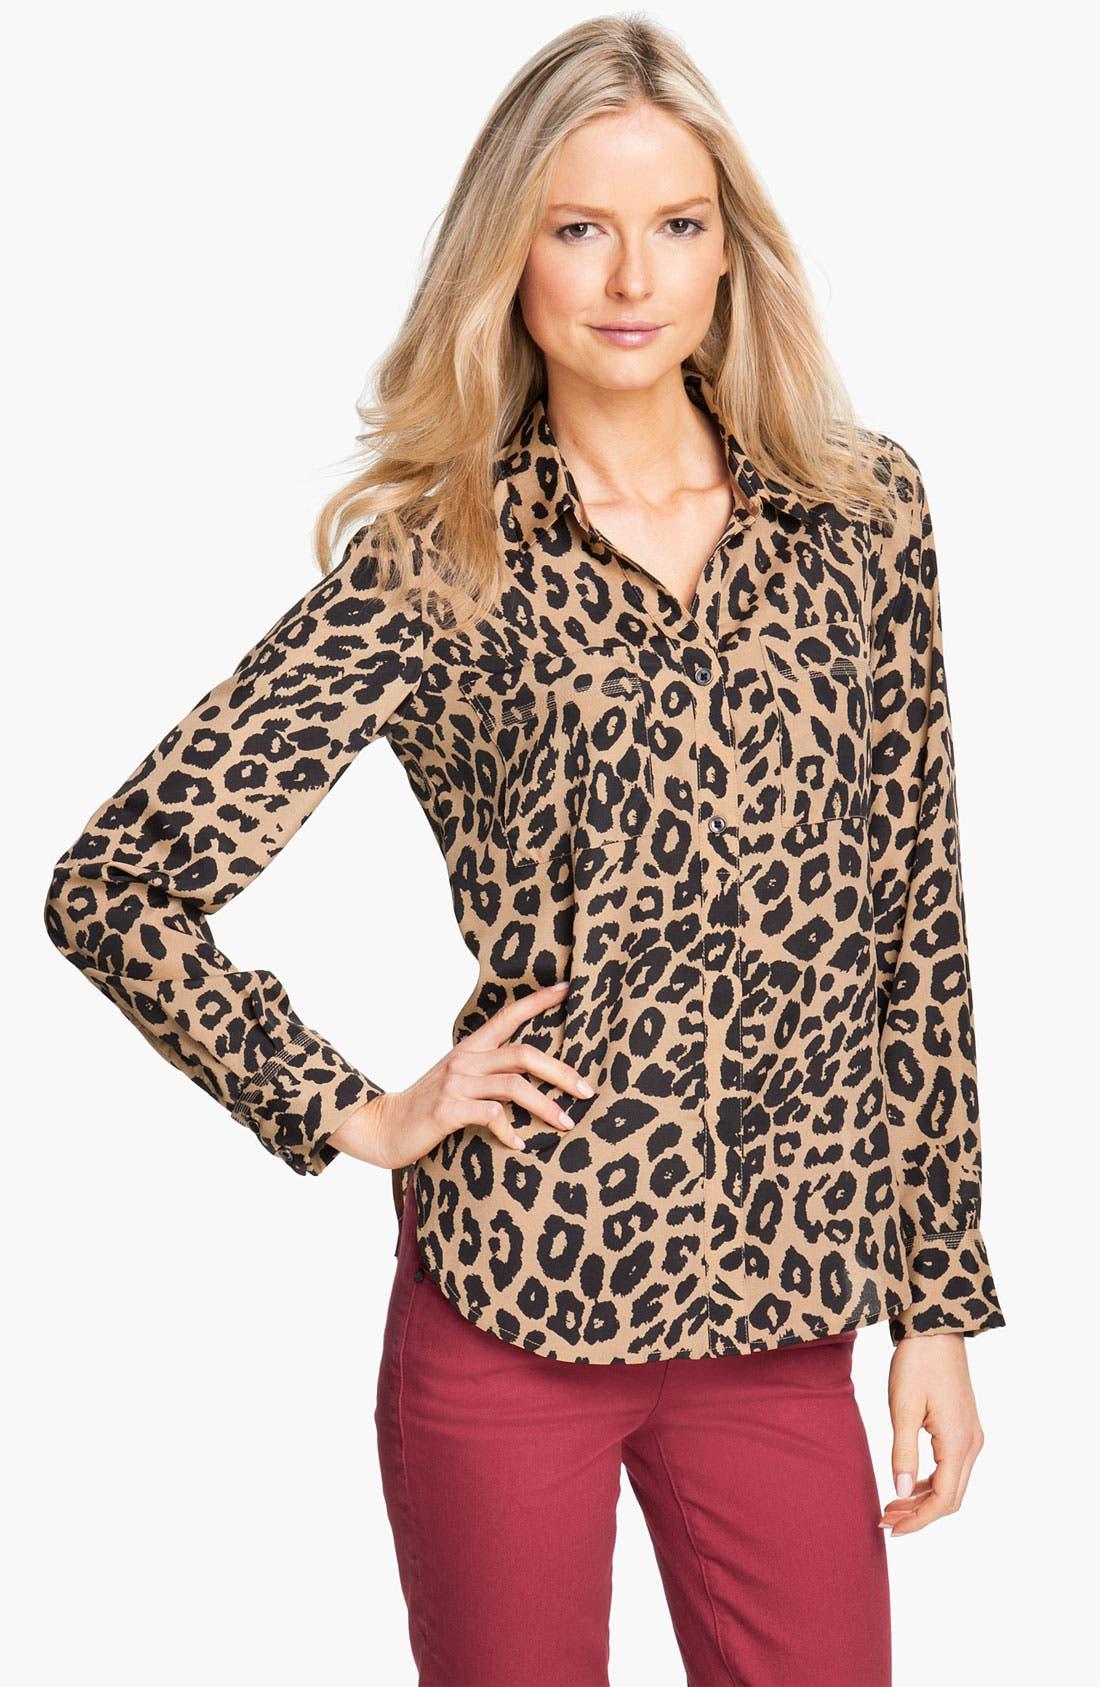 Alternate Image 1 Selected - Isaac Mizrahi Jeans 'Alexis' Leopard Print Shirt